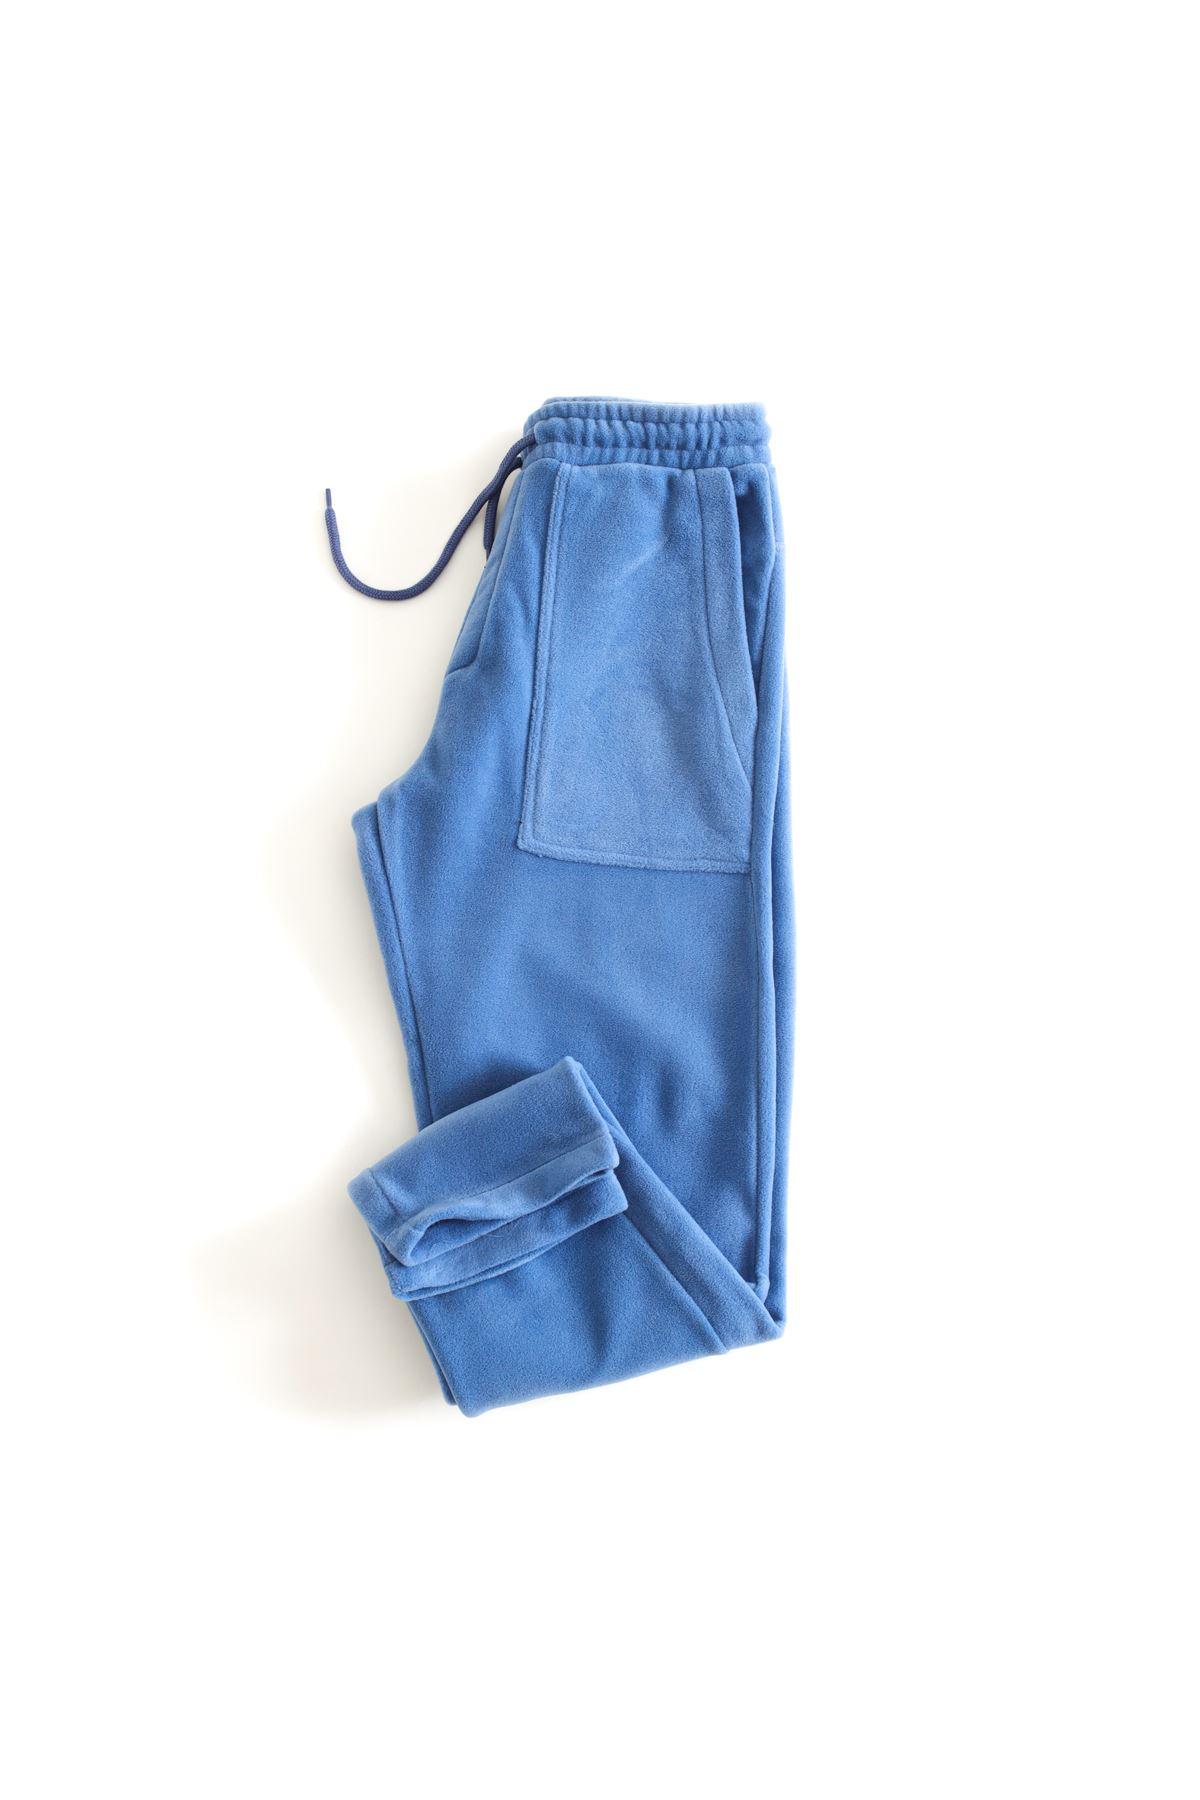 Mavi Polar Jogger Pantolon